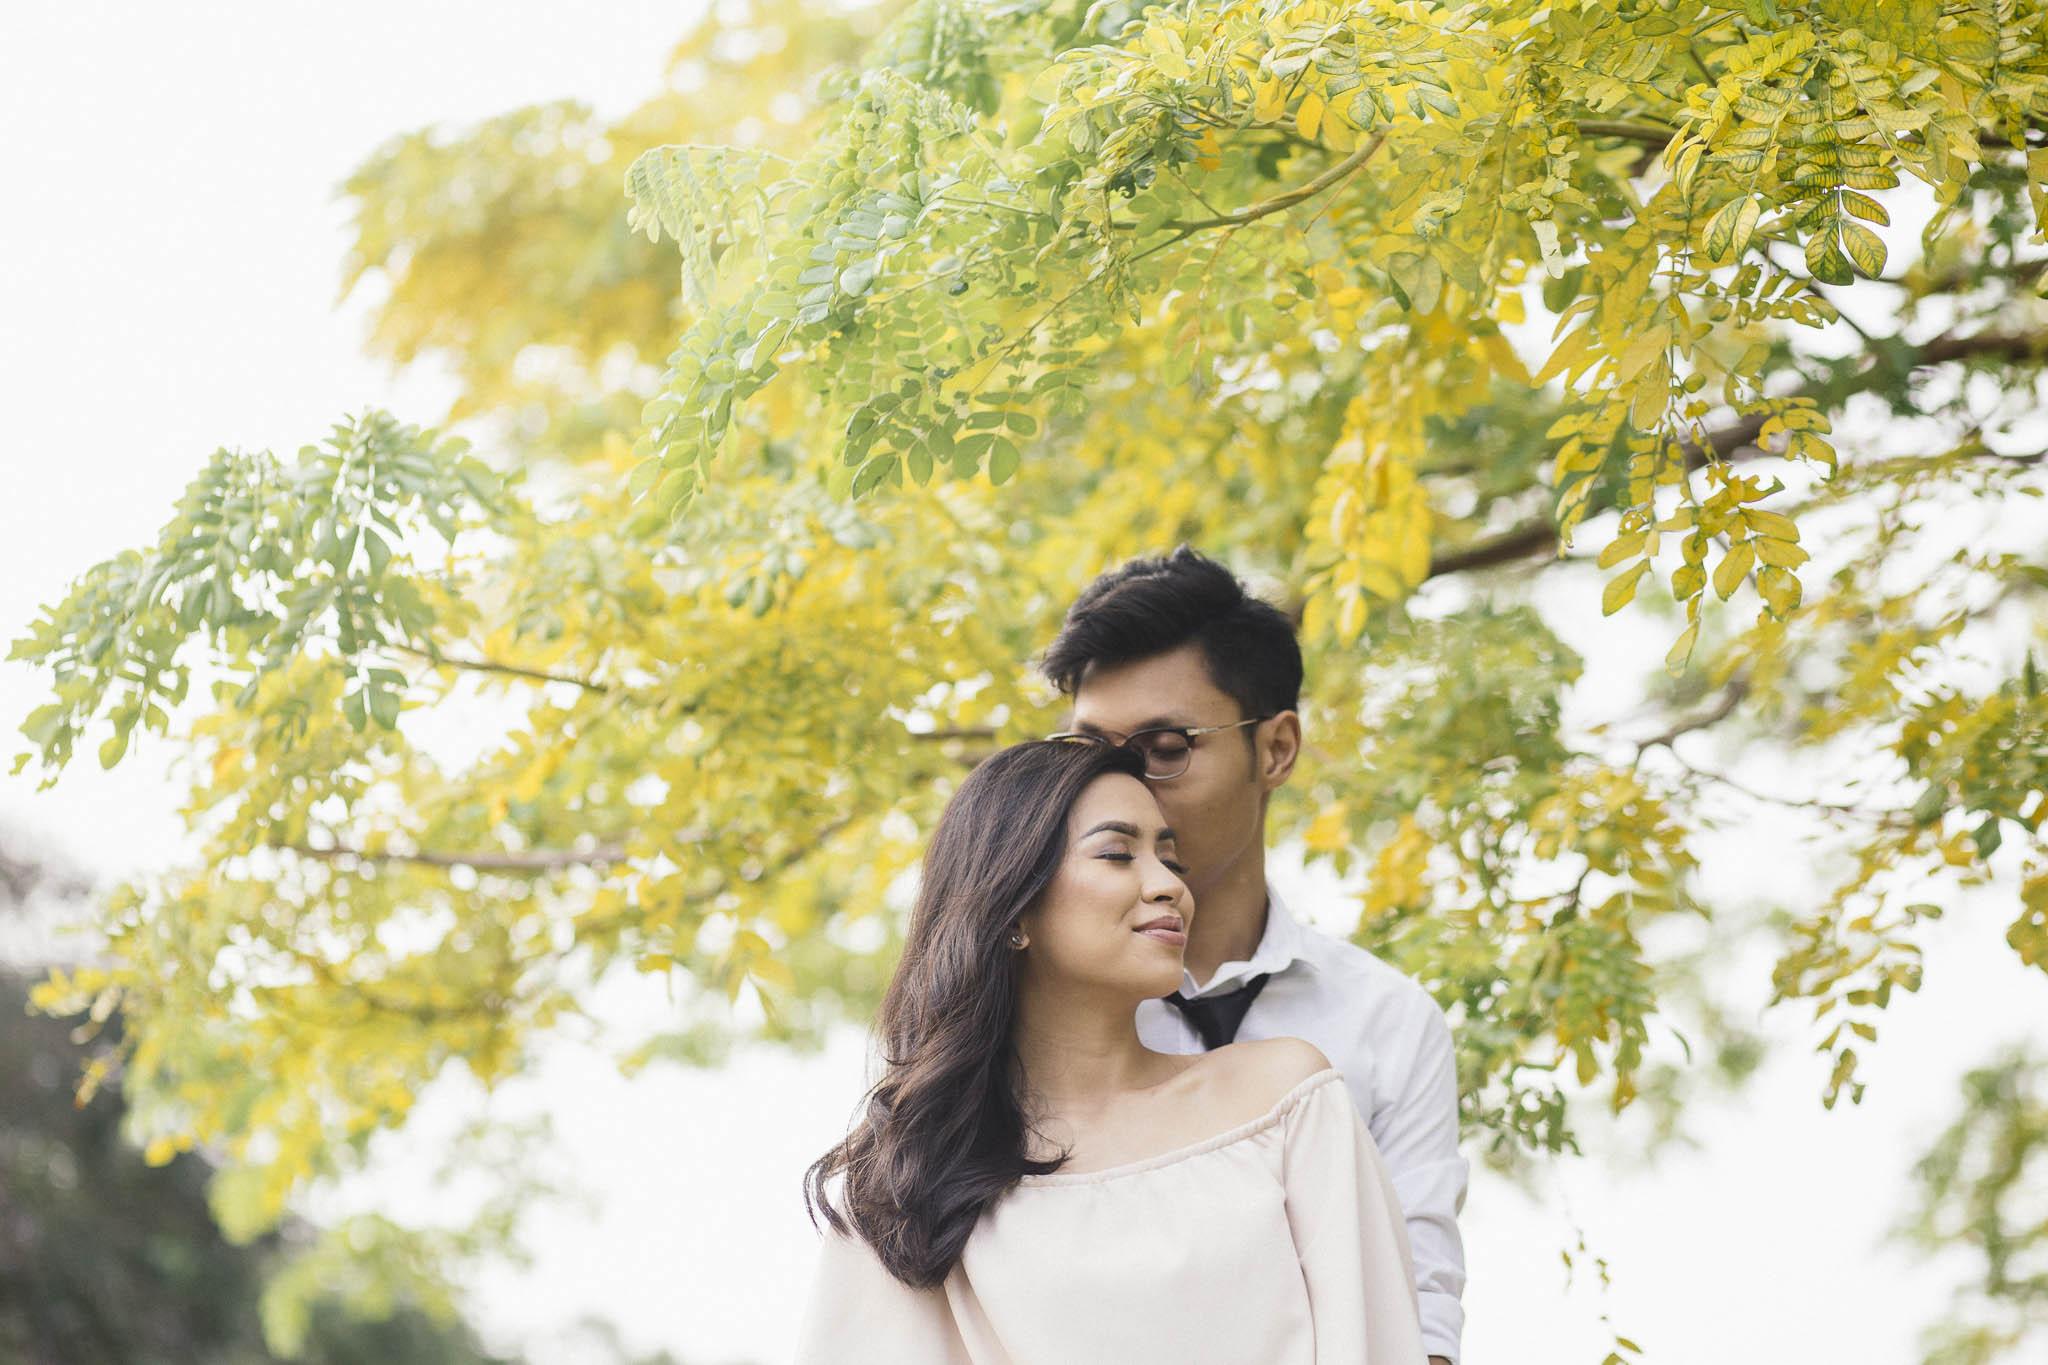 singapore-wedding-photographer-malay-travel-adli-tashah-22.jpg